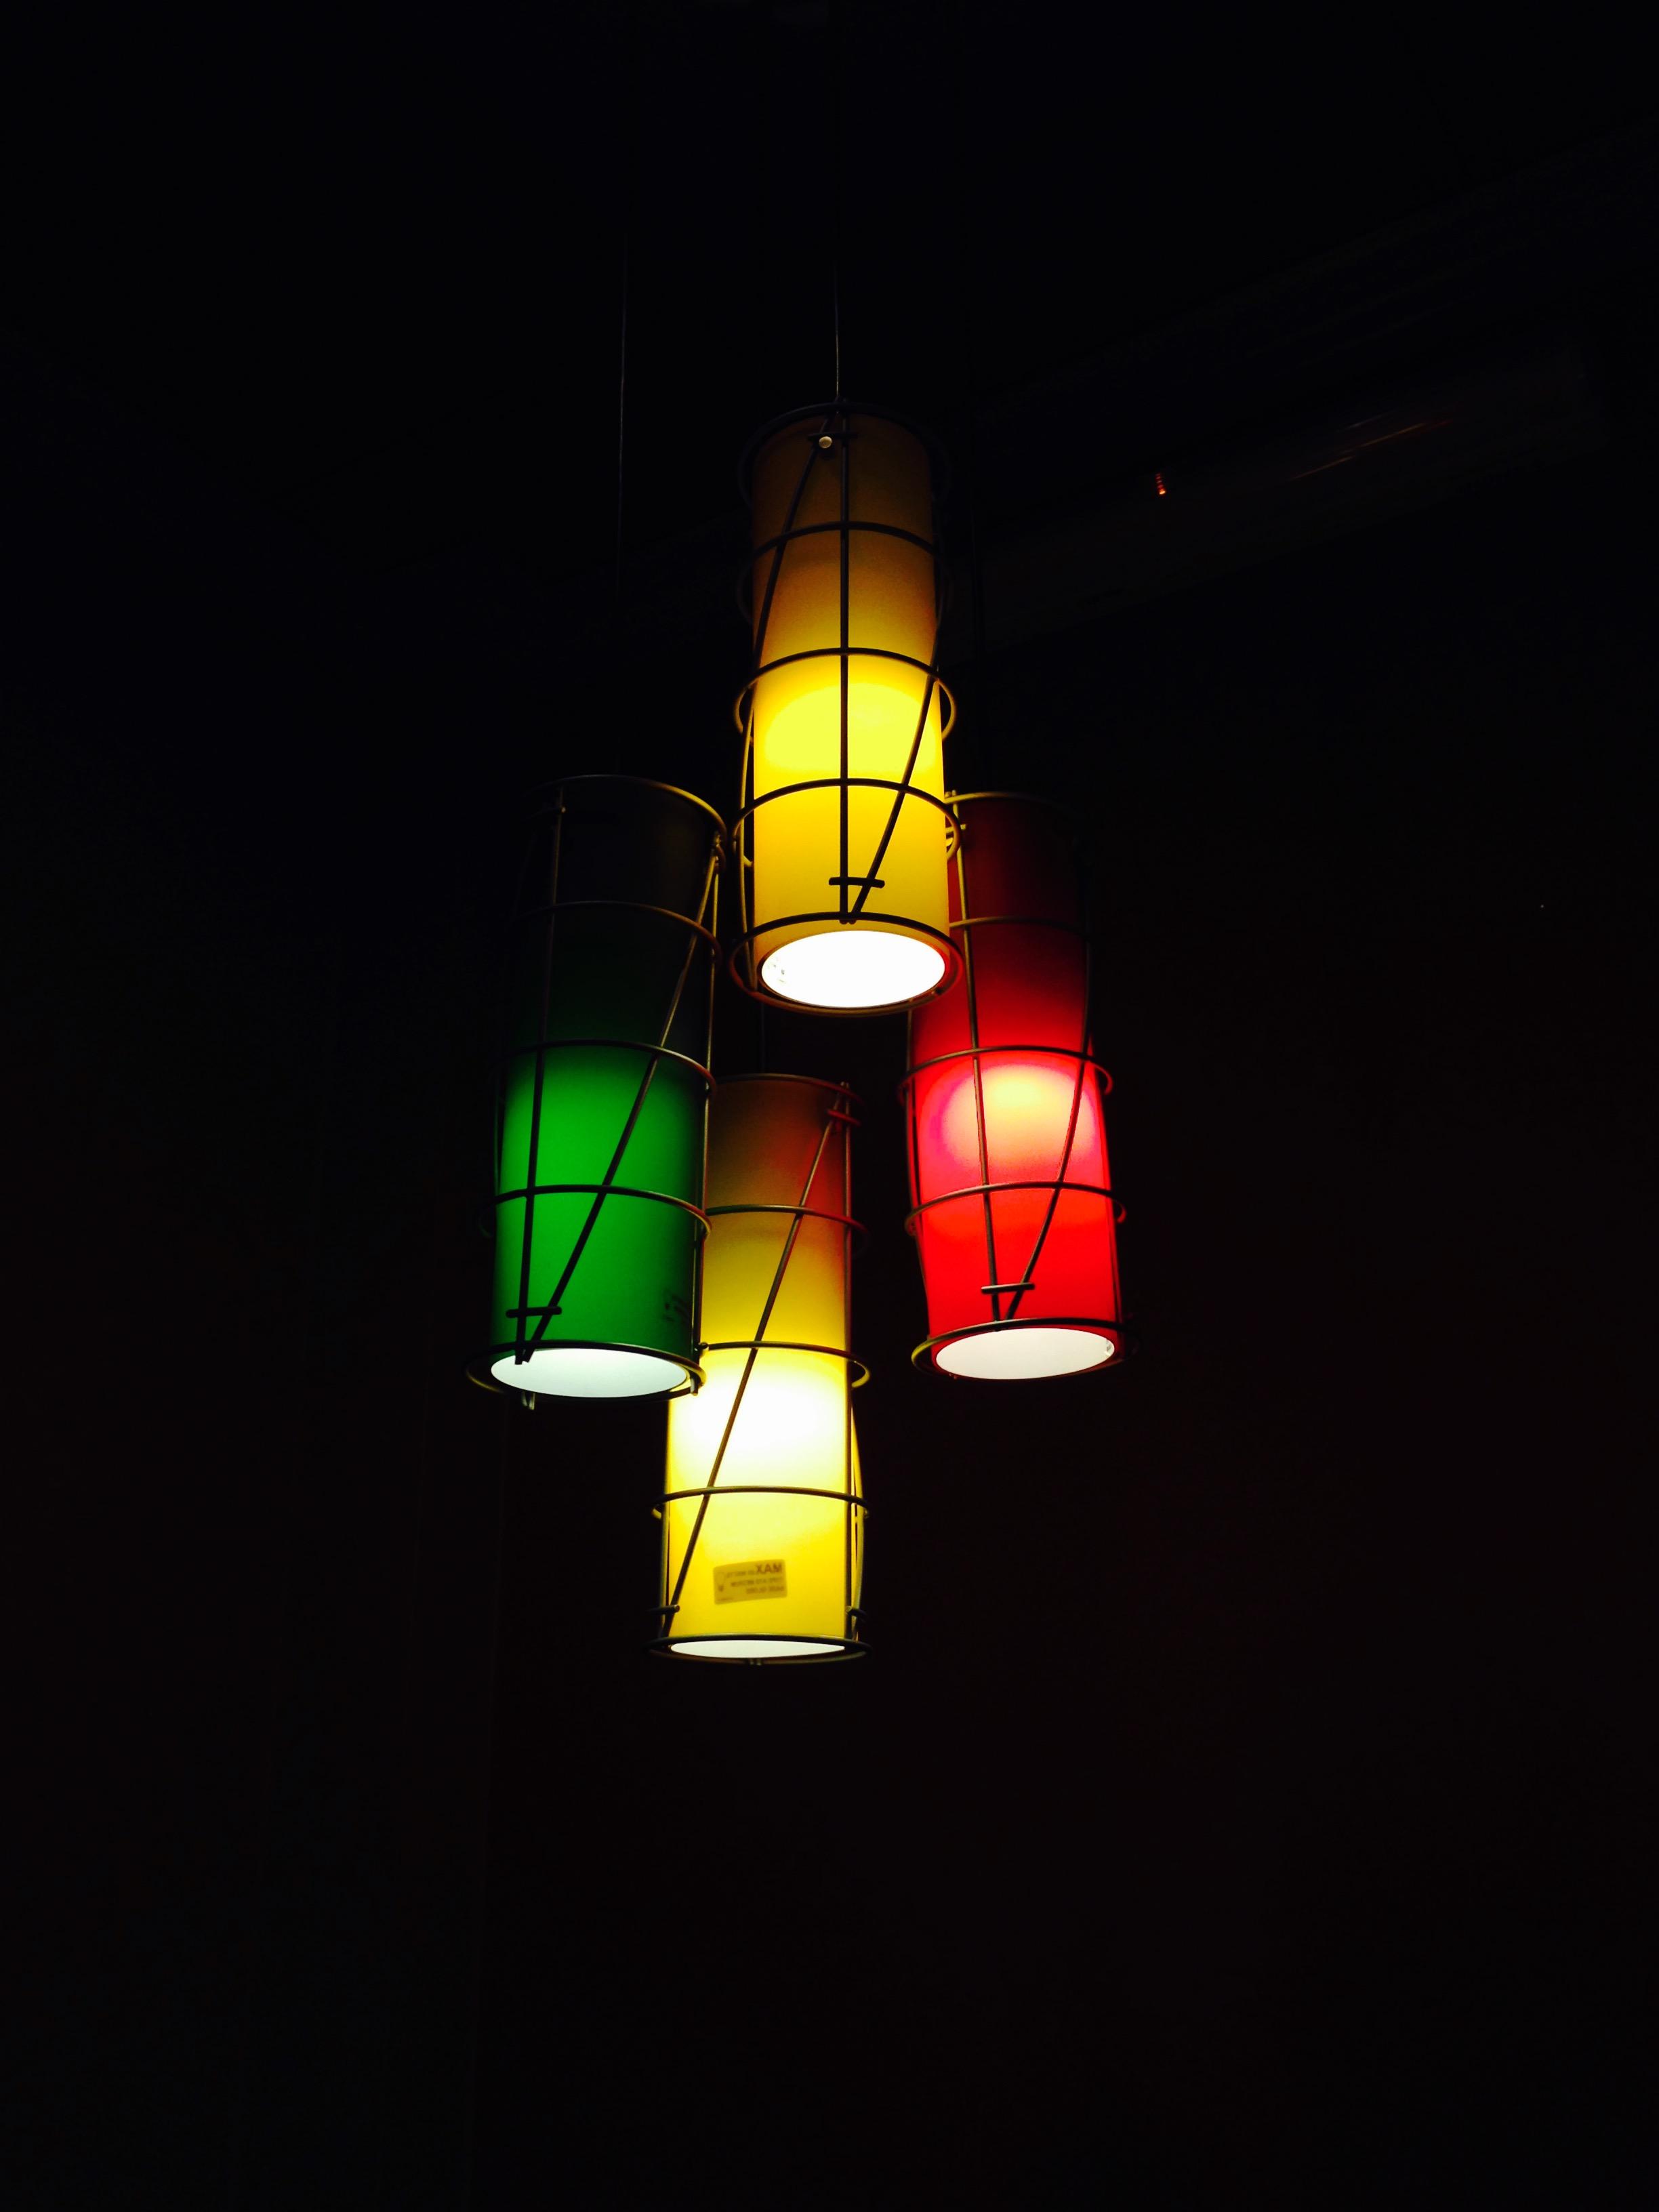 Dim Lighting Definition Applebees Interior Lights The Four